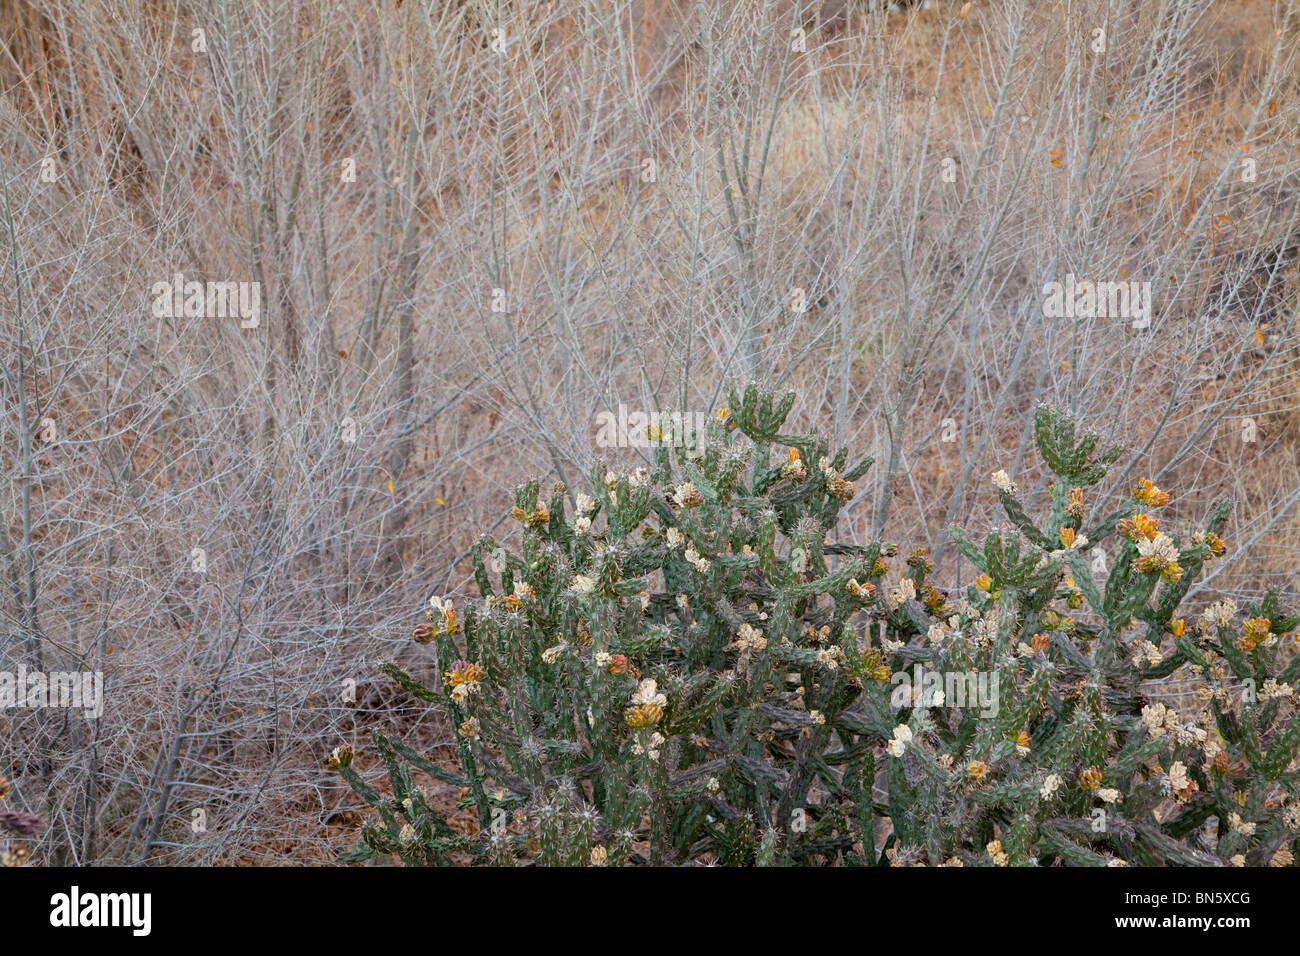 cactus & brush in California desert - Stock Image